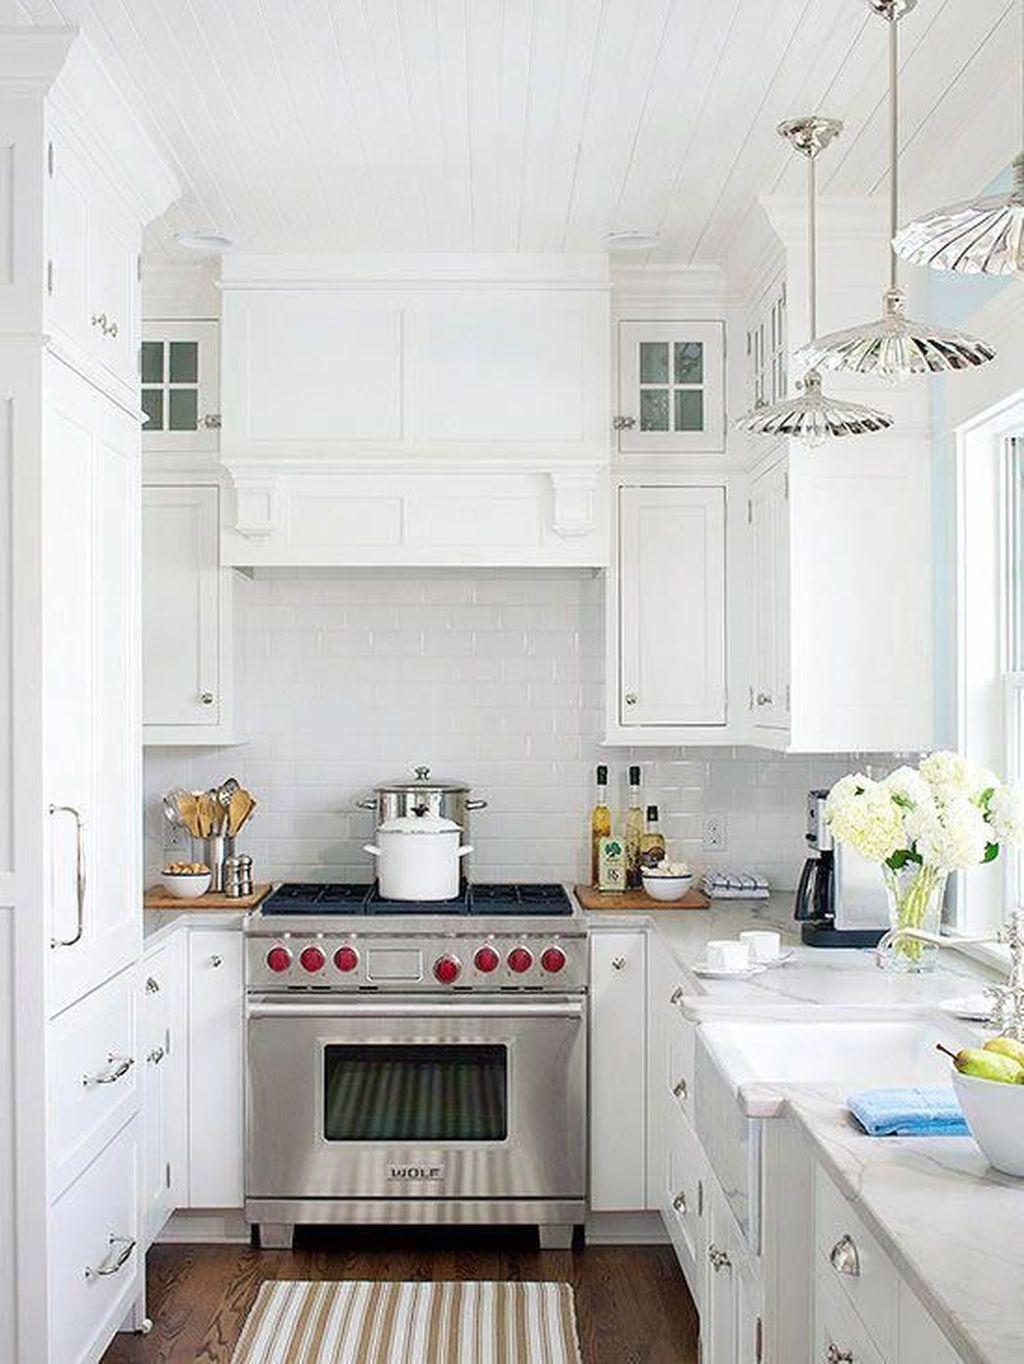 Brilliant Small Kitchen Remodel Design Ideas On A Budget 30